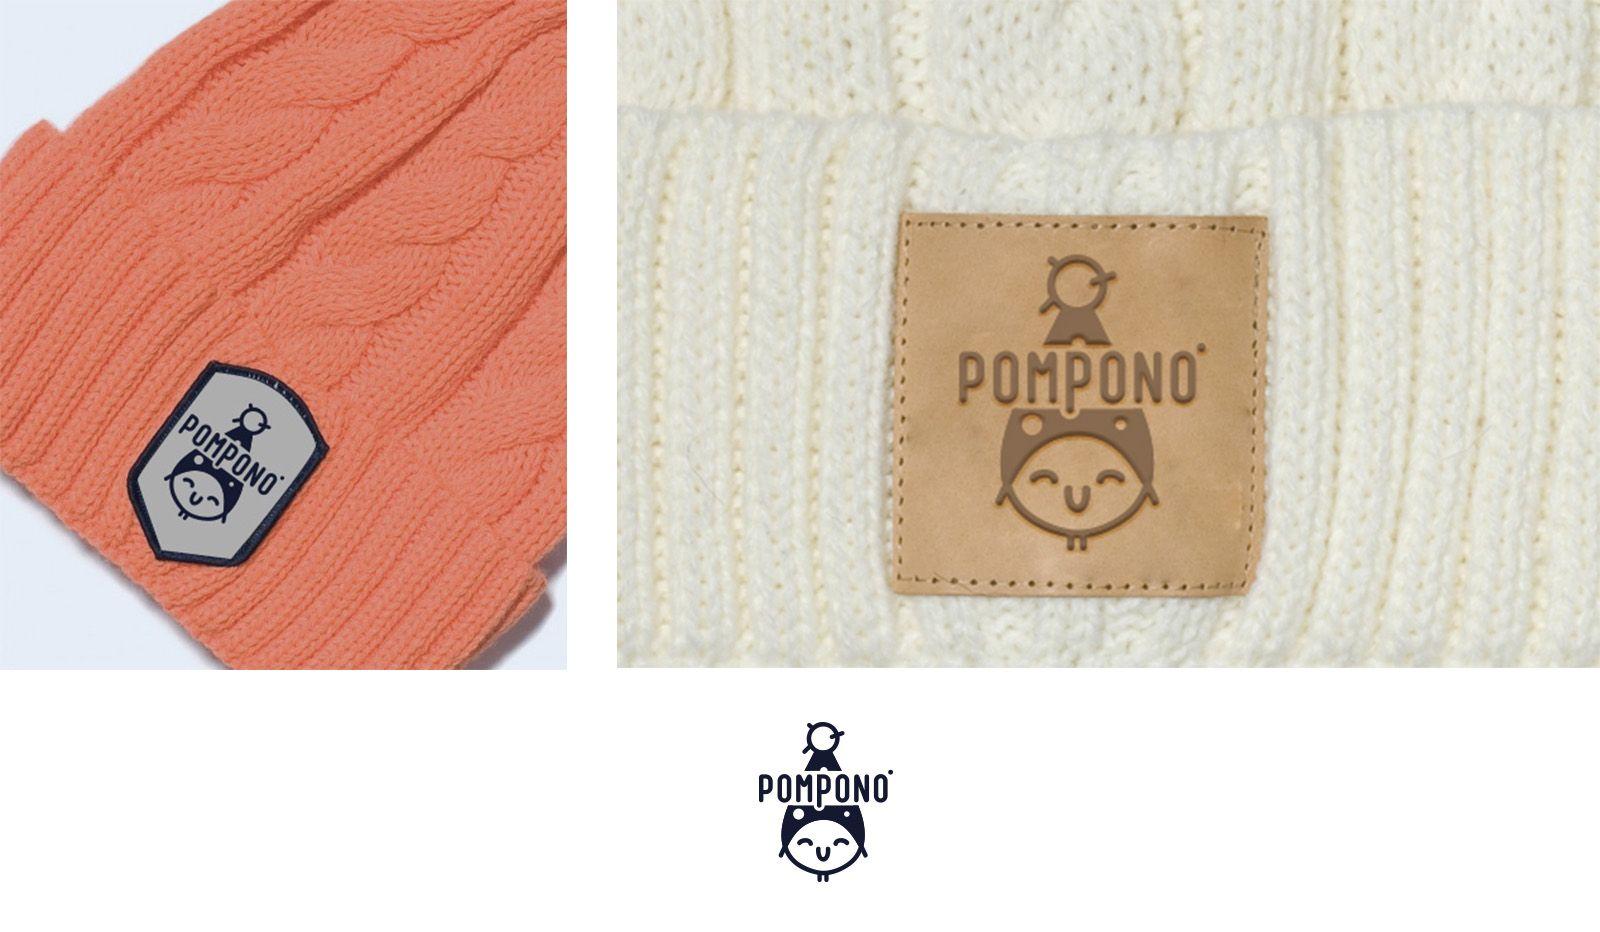 Логотип для шапок Pompono - дизайнер Martins206